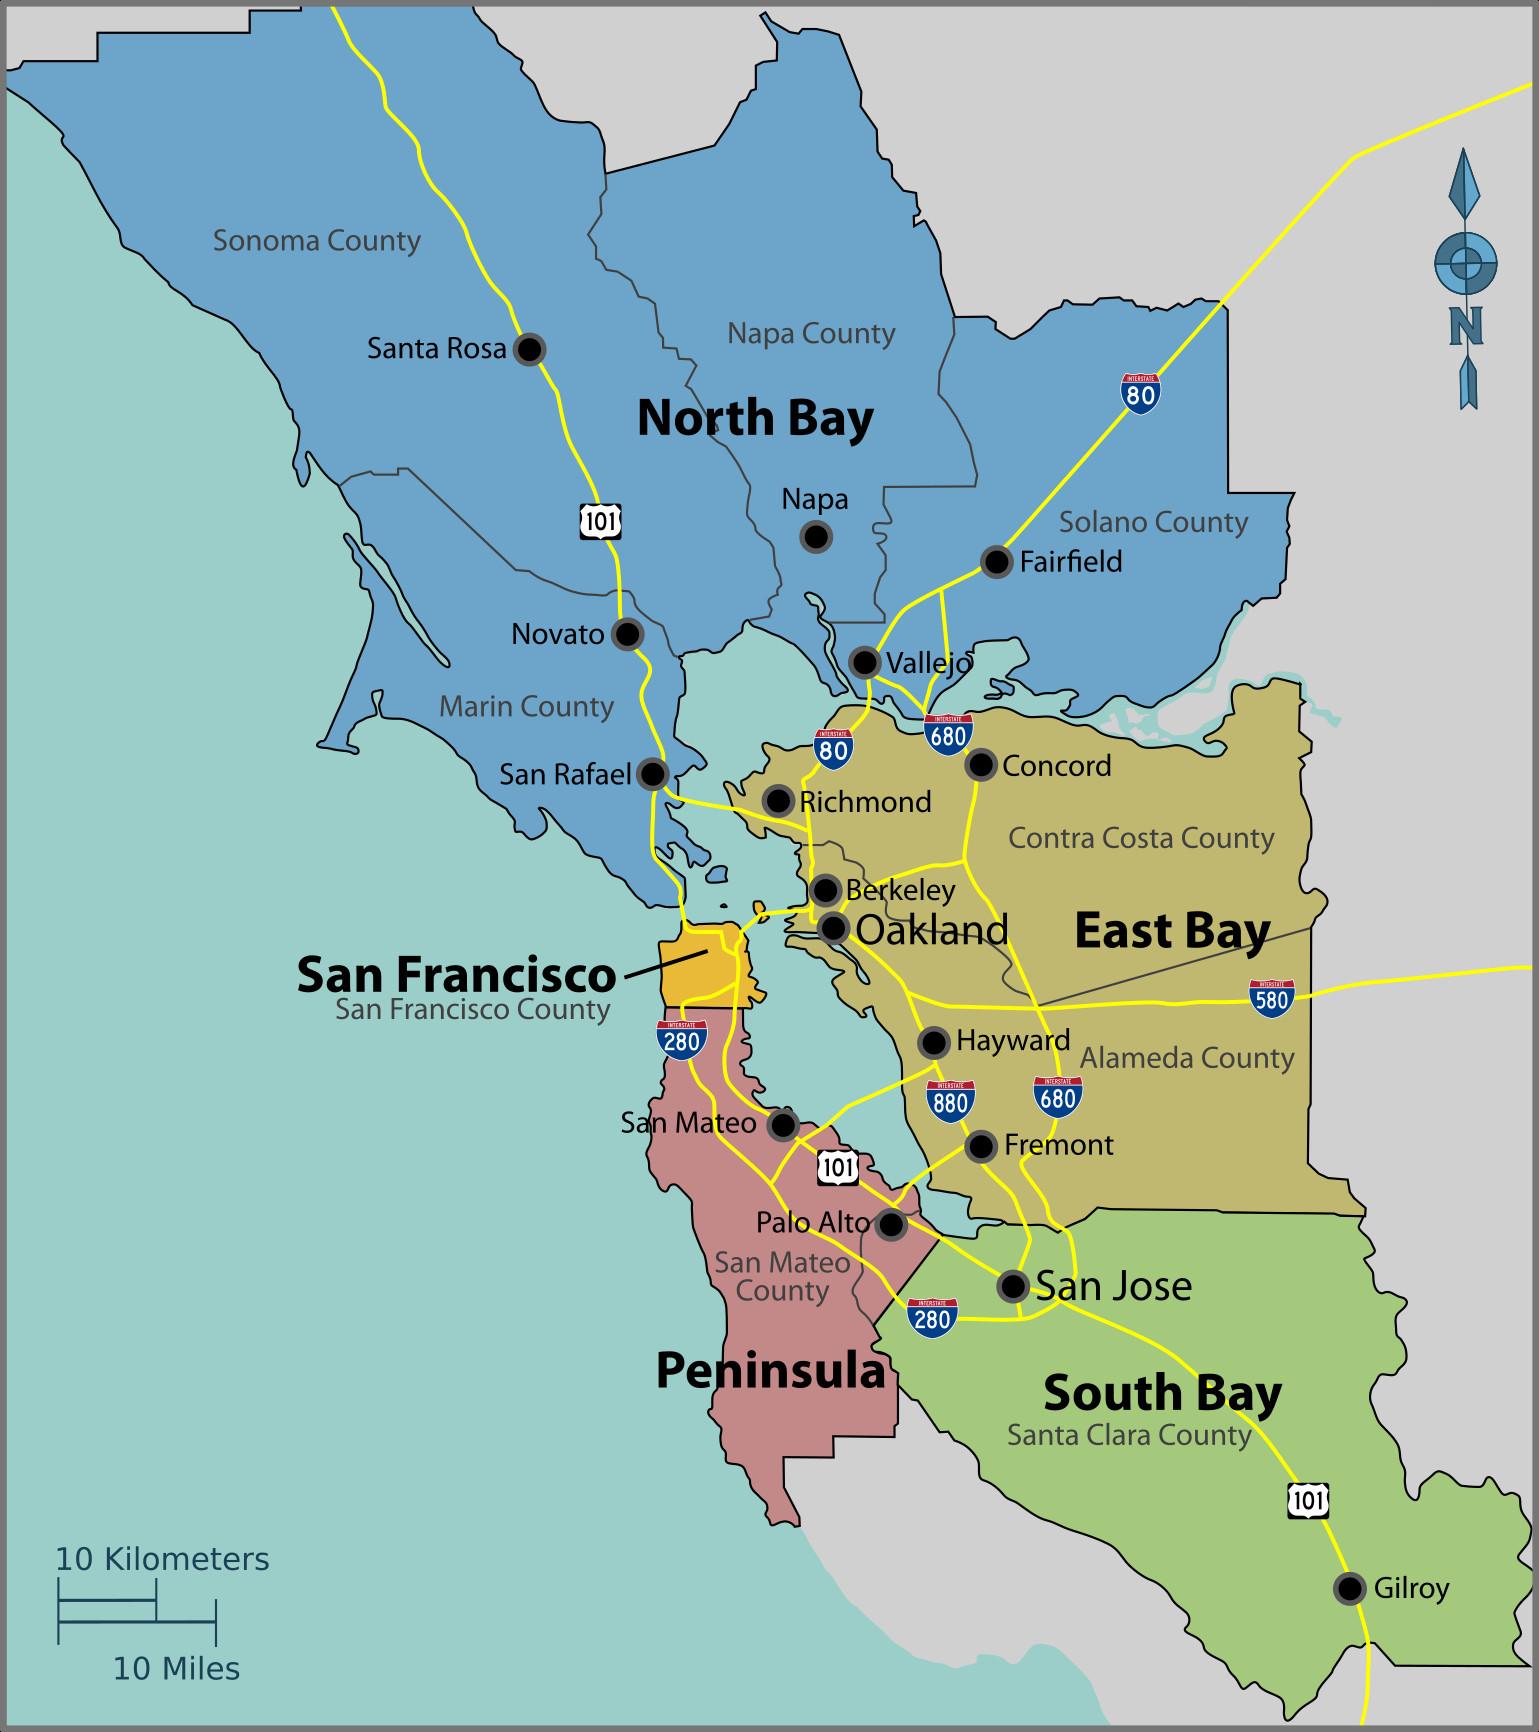 Where Is San Mateo California On The Map Fresh San Francisco Bay - San Mateo California Map